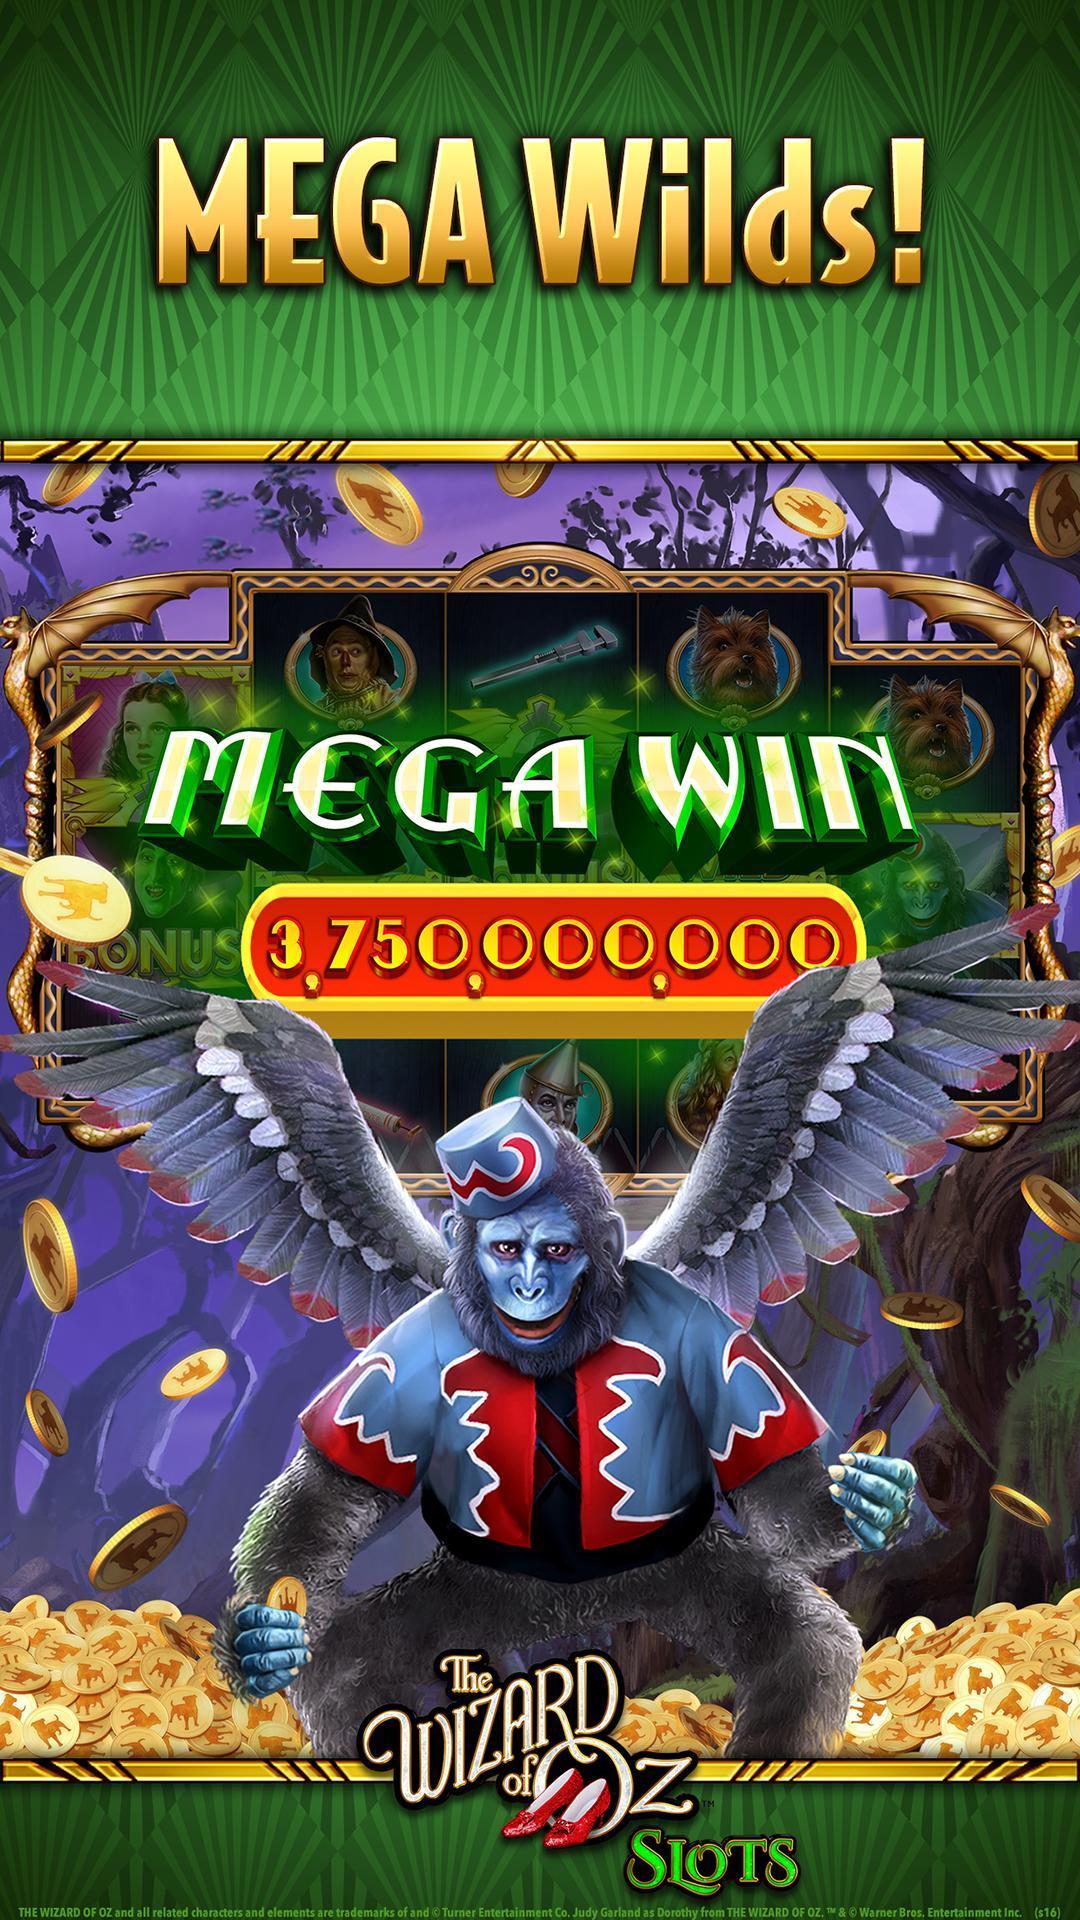 Wizard of Oz Free Slots Casino 134.0.2045 Screenshot 2